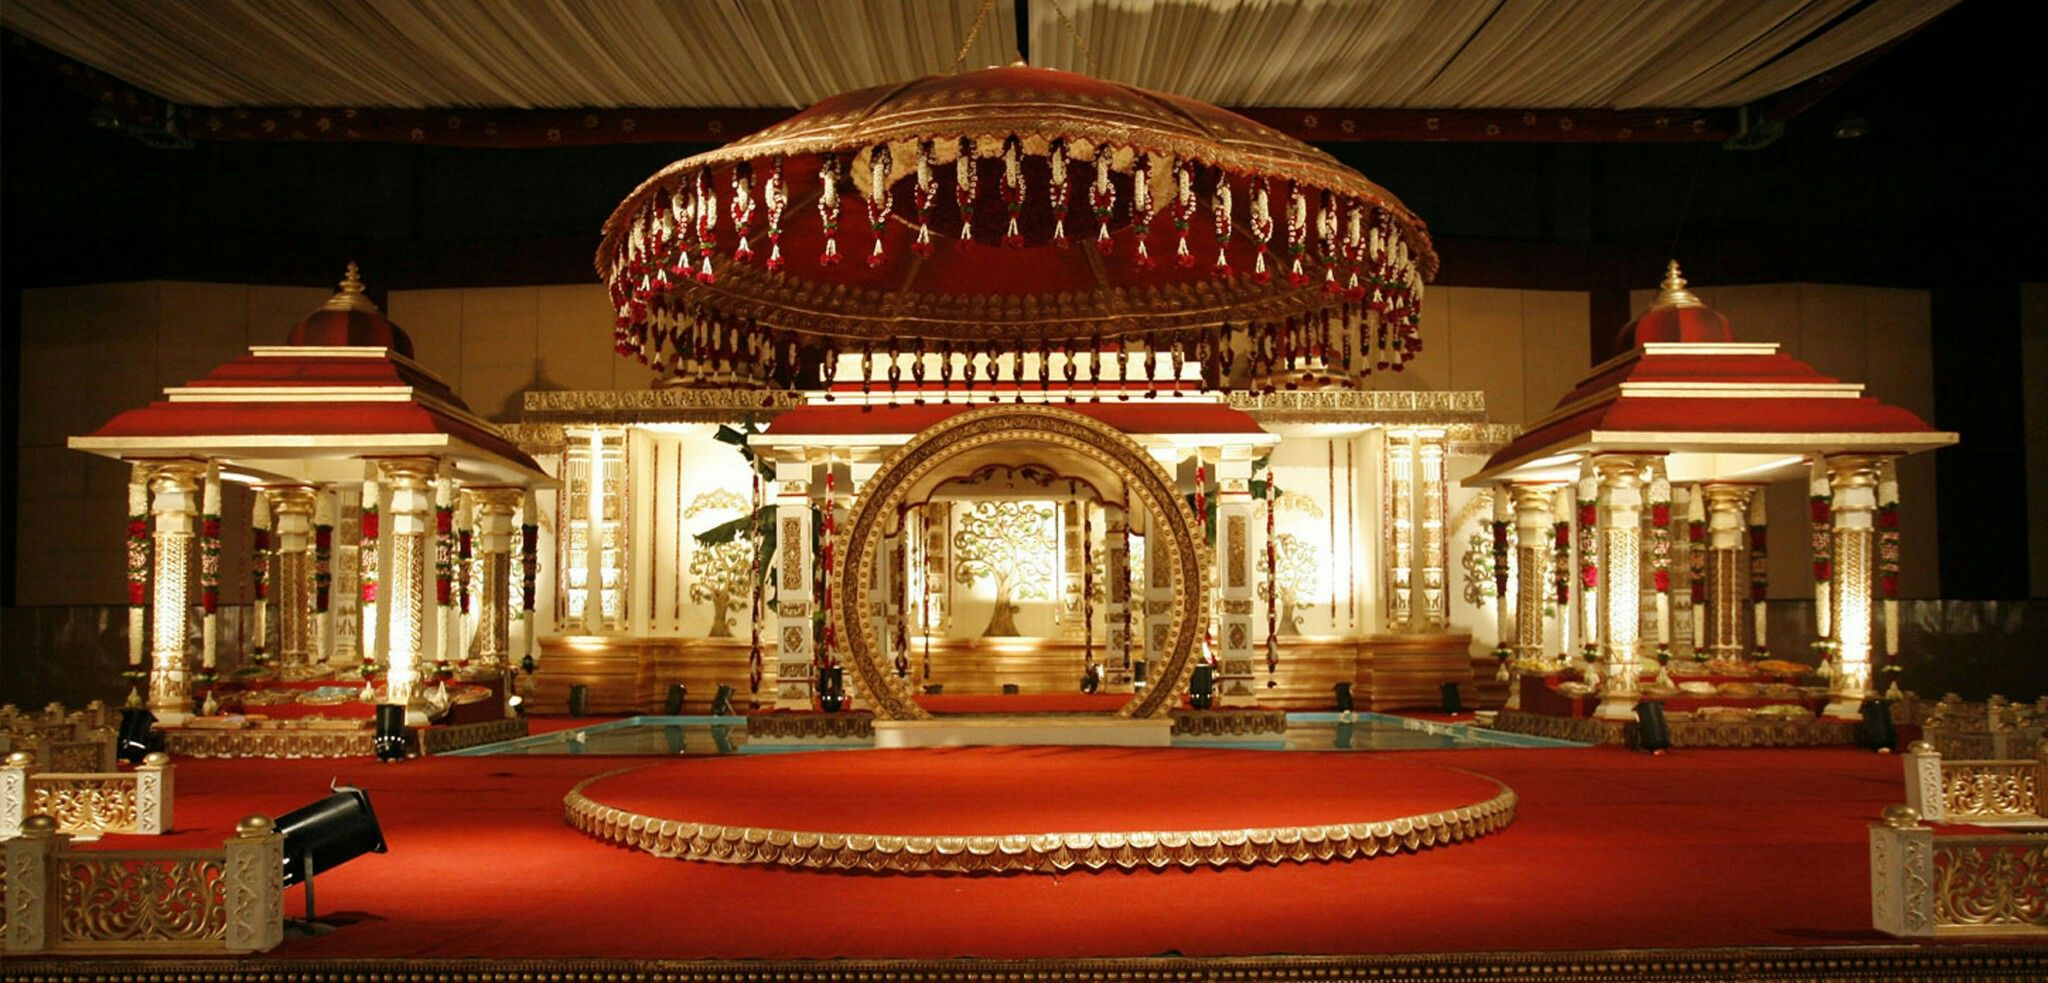 Wedding decoration ideas kerala  Pin by Manjula Reddy on Decoration  Pinterest  Decoration